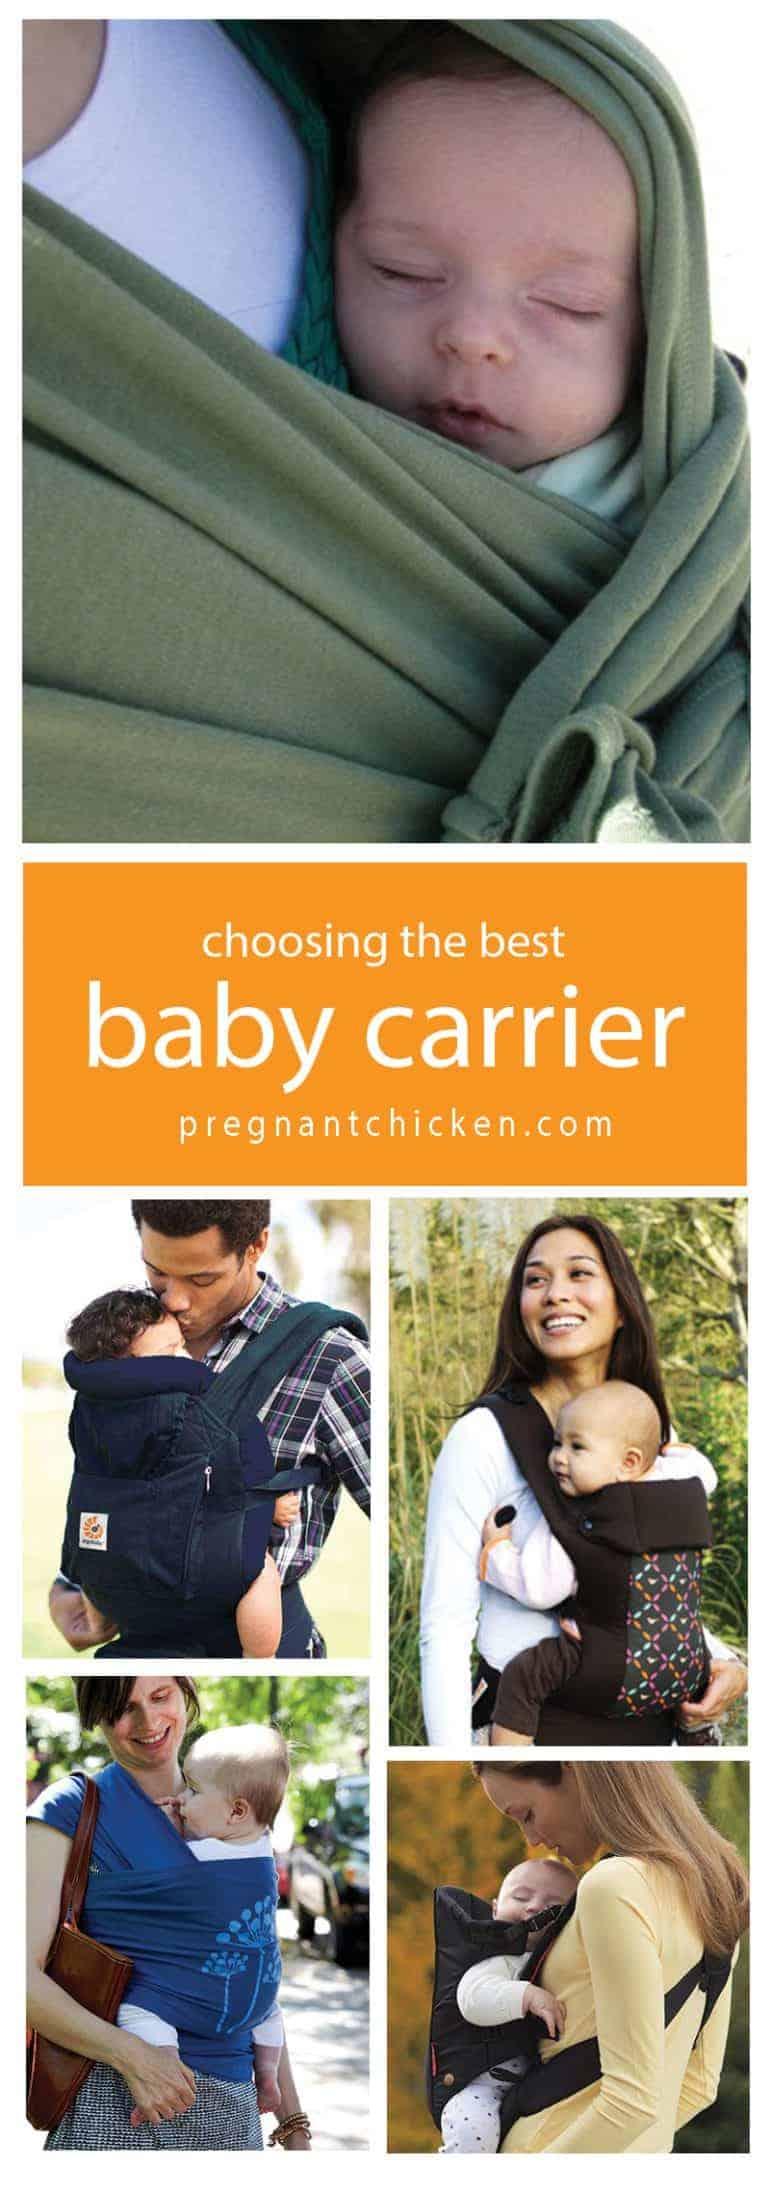 Choosing the best baby carrier